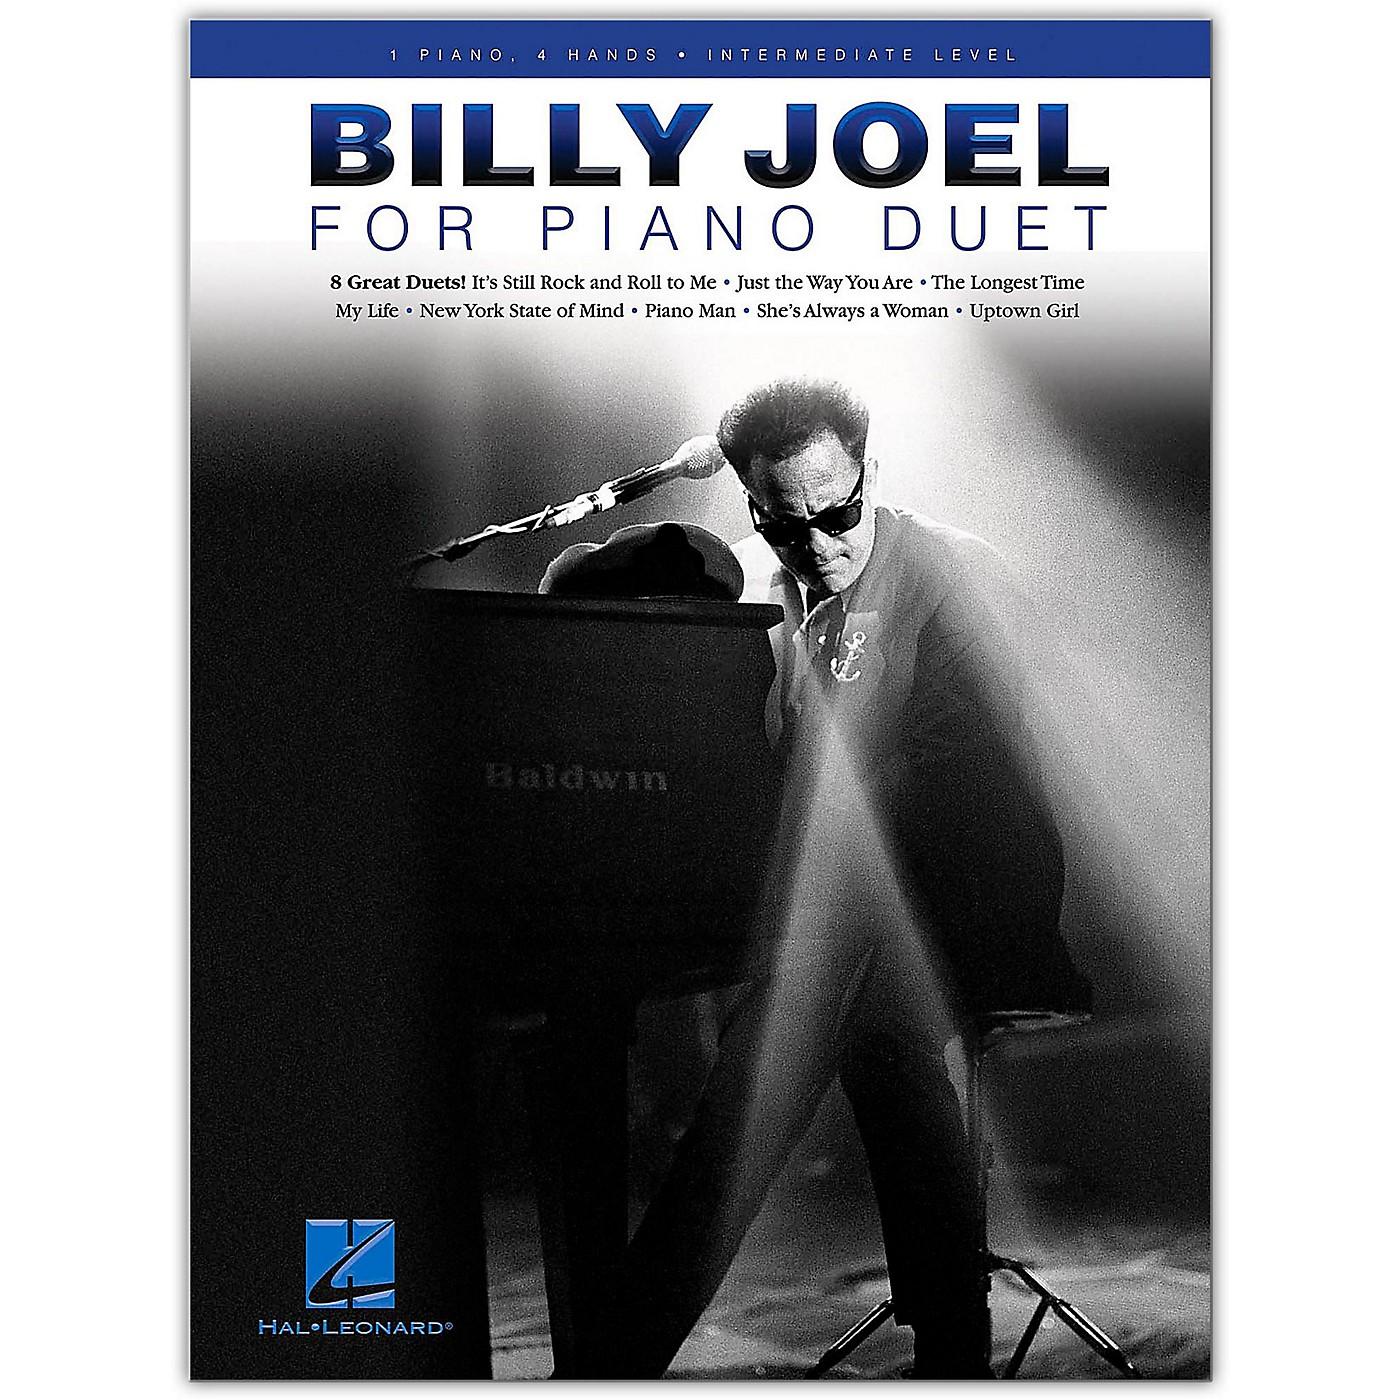 Hal Leonard Billy Joel for Piano Duet - 1 Piano, 4 Hands / Intermediate Level thumbnail